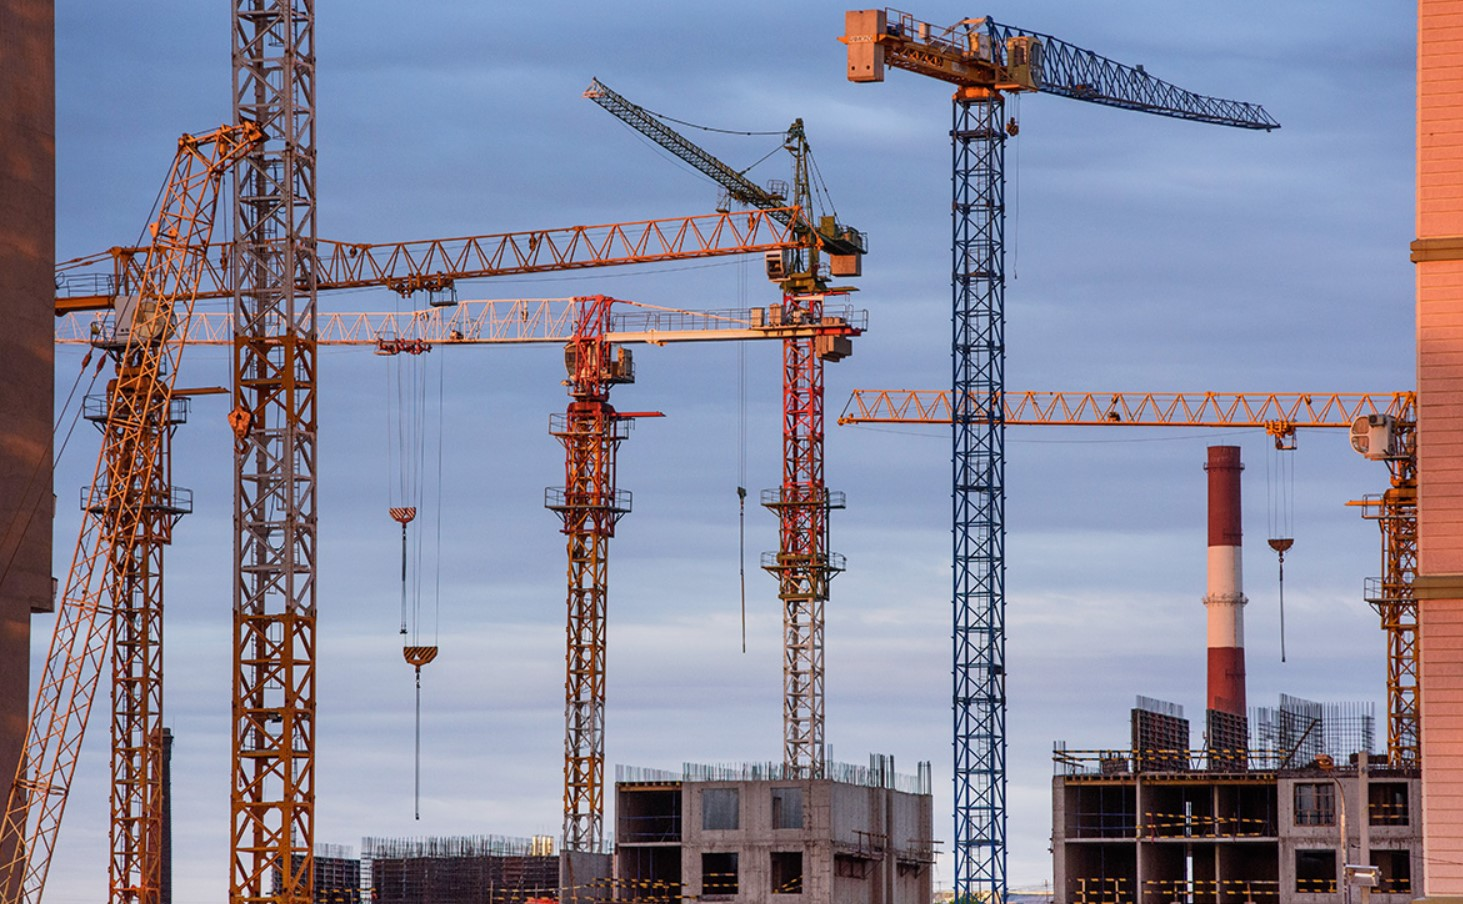 Строительство инфраструктуры. Будівництво інфраструктури